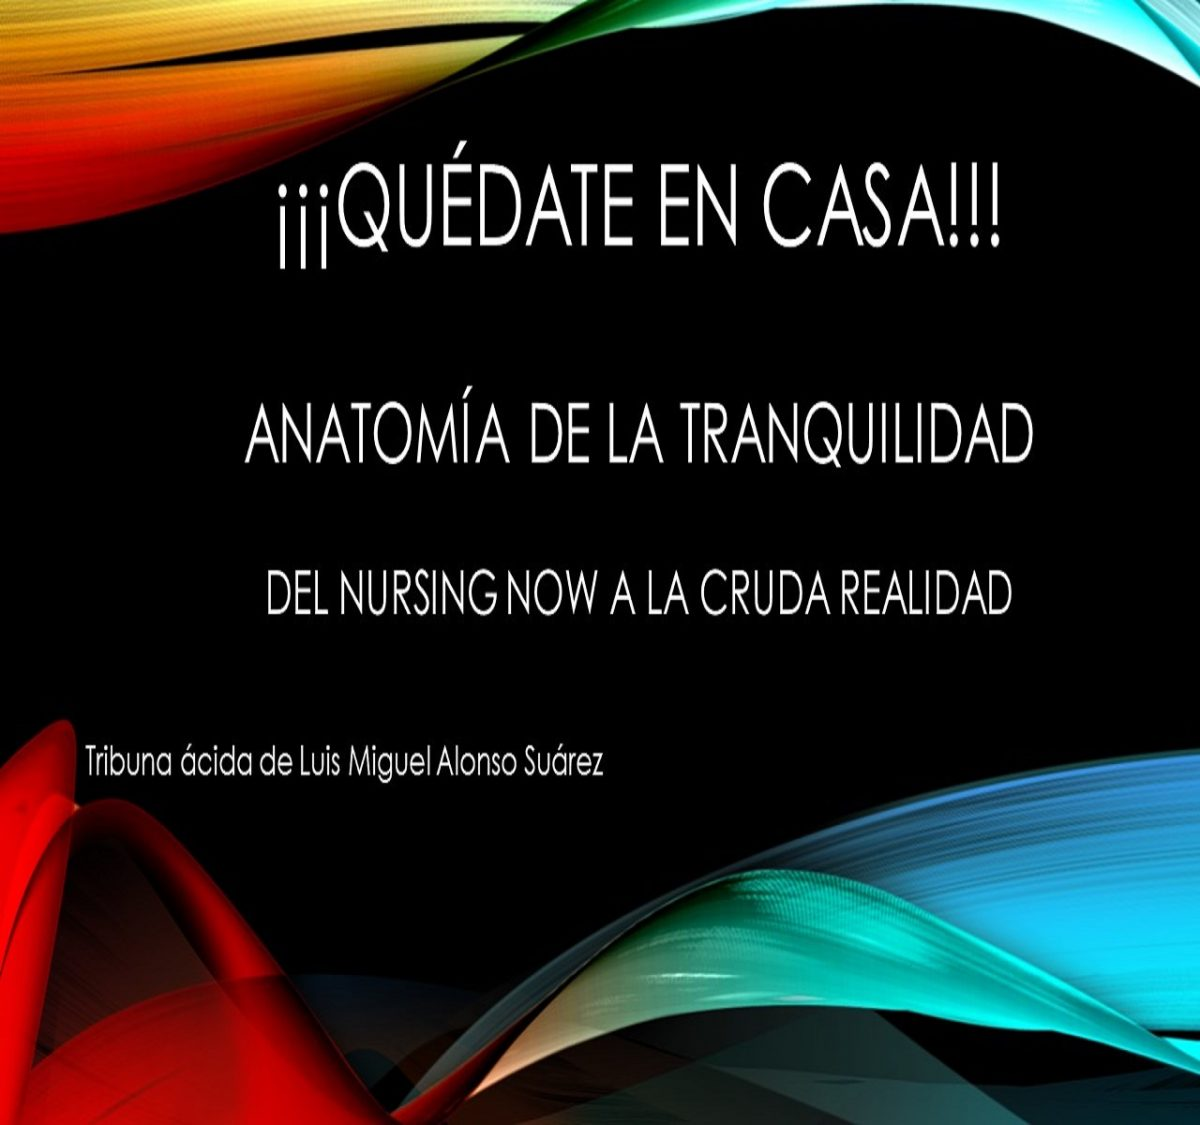 ¡¡¡QUEDATE EN CASA!!!